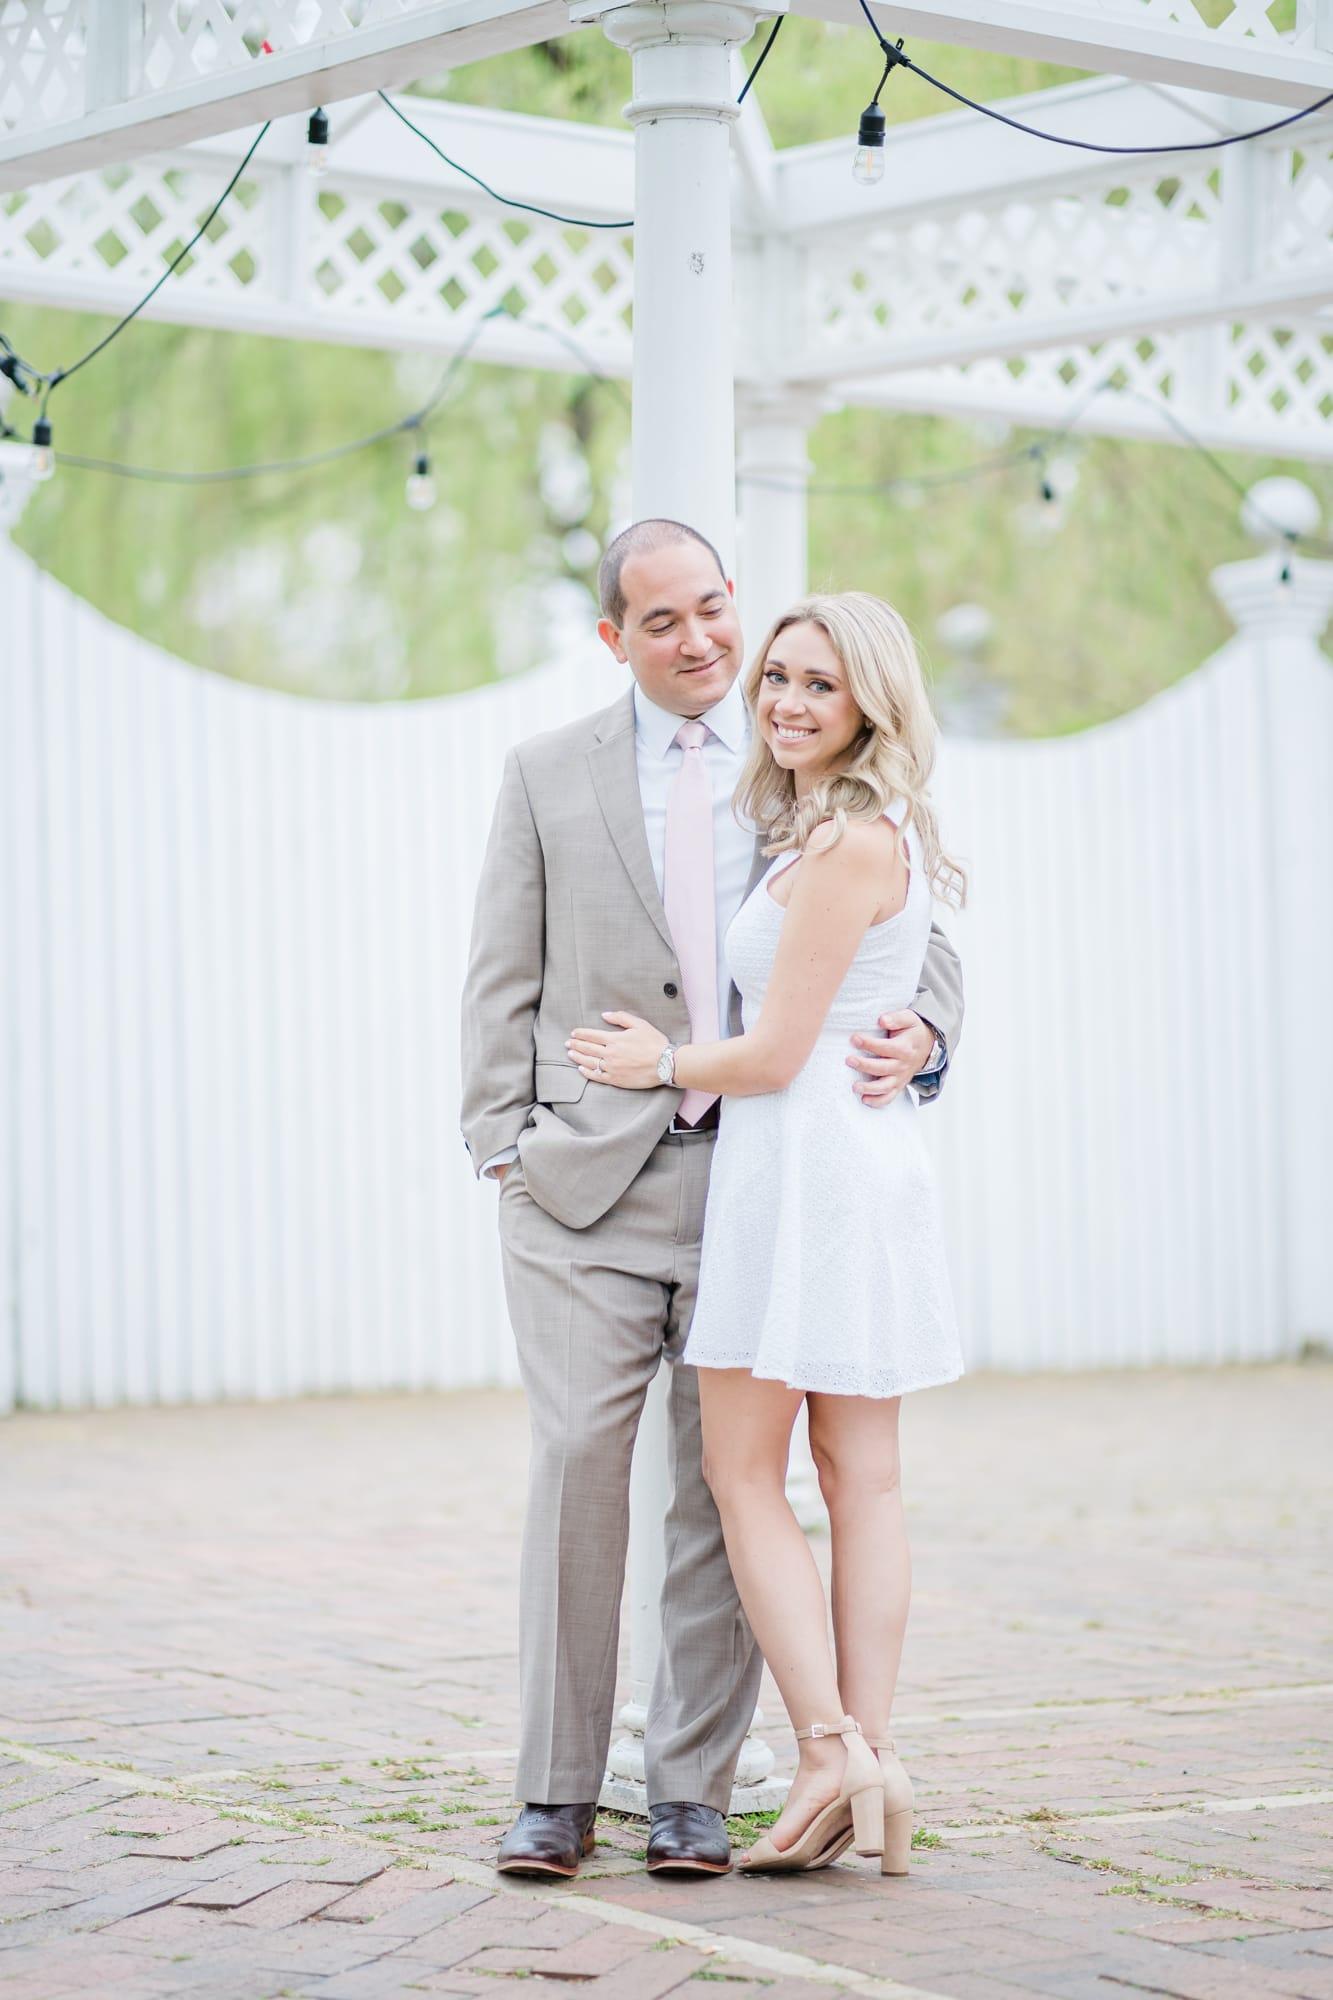 Engagement photos at Talleyrand Park spring